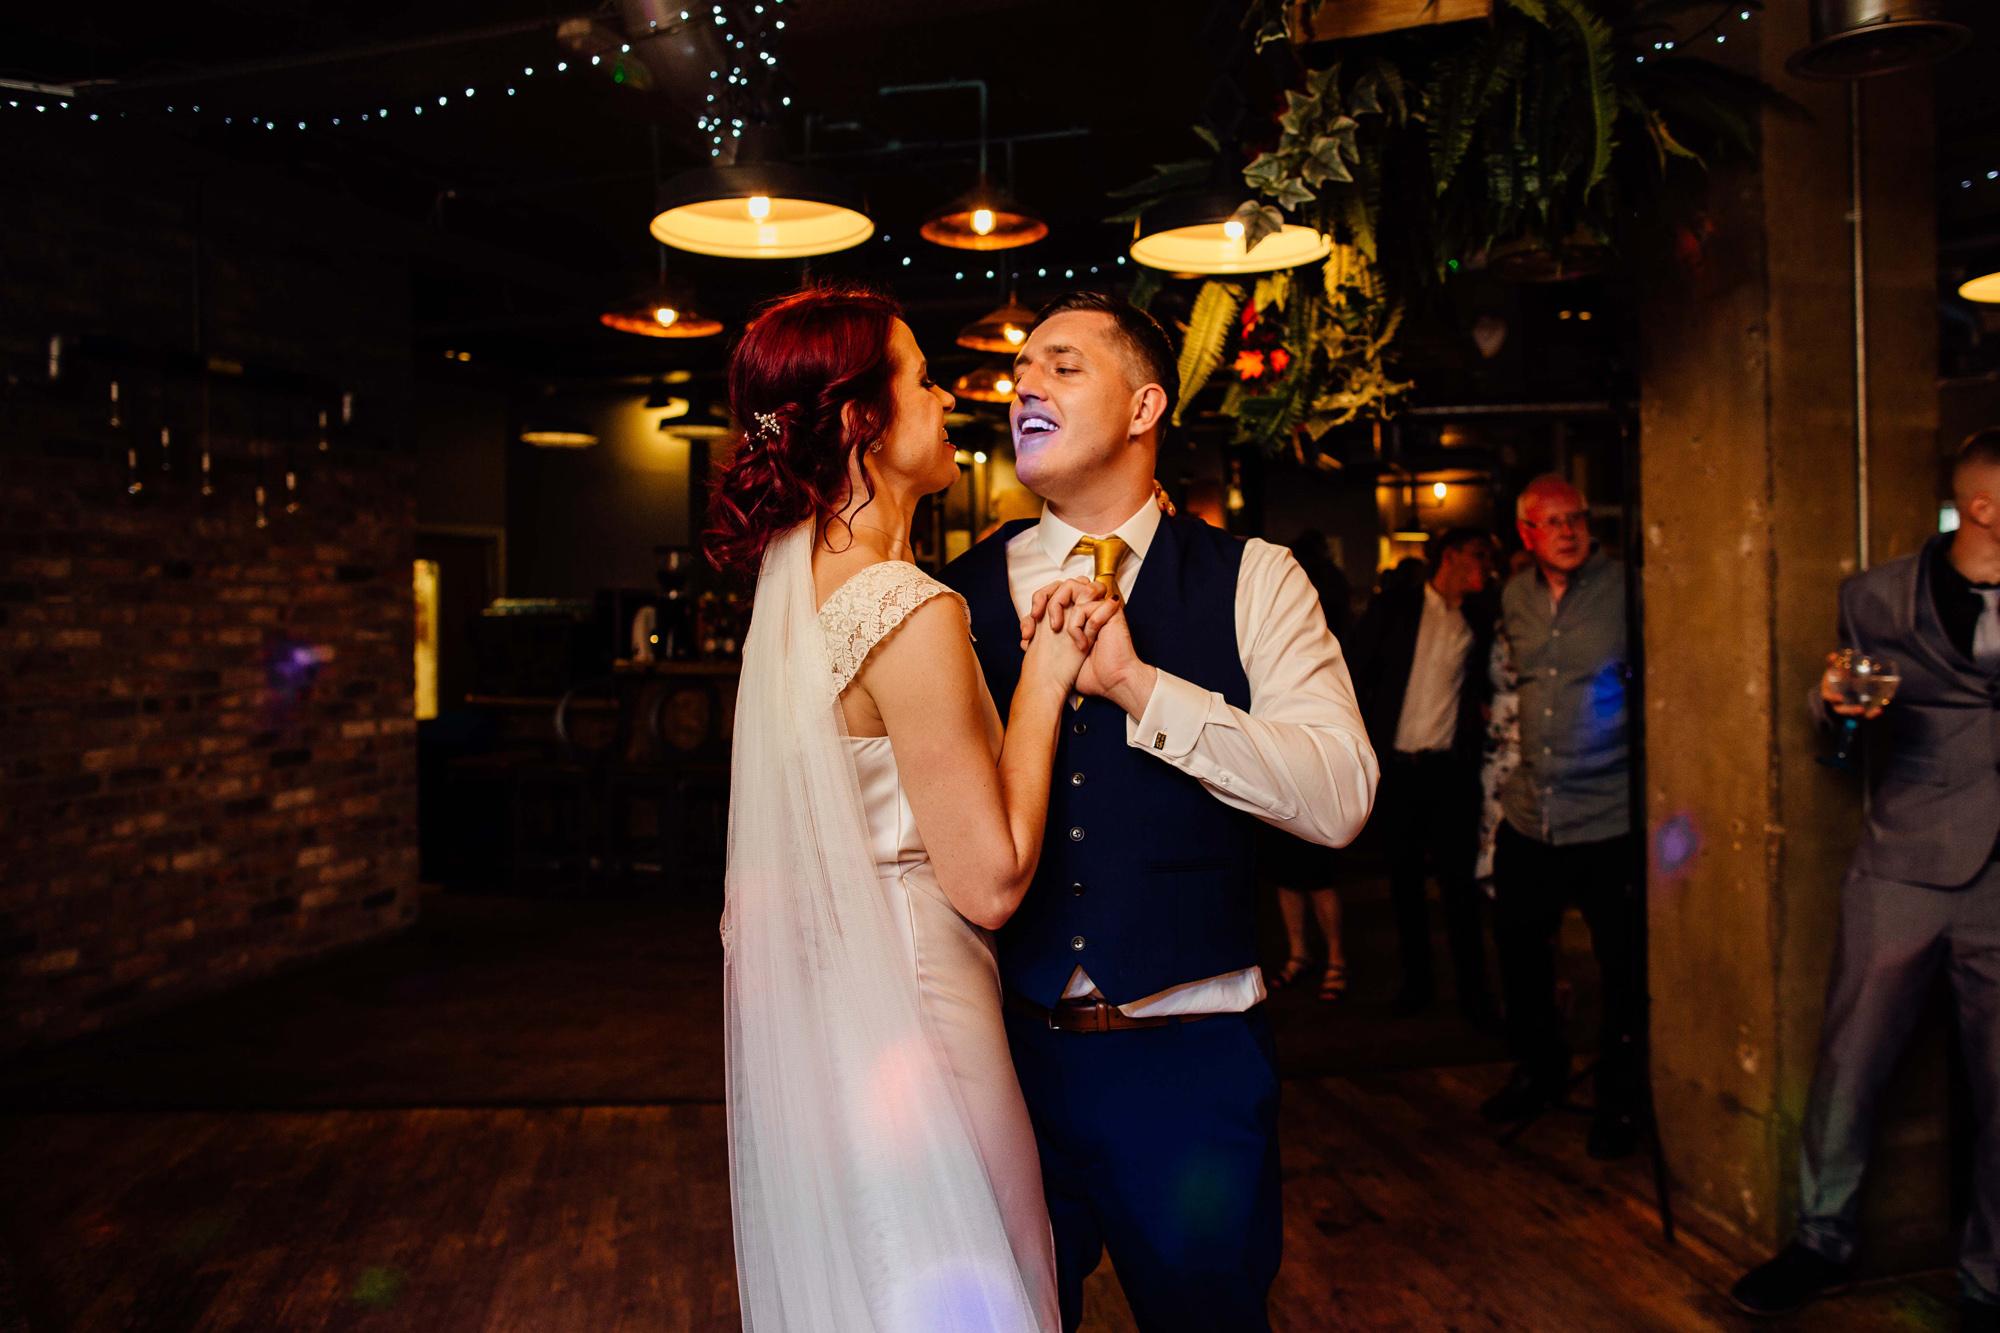 Sarah-Honeysuckle-Bias-Cut-Silk-Vintage-Inspired-Wedding-Gown-Sheffield-Wedding-Kate-Beaumont-61.jpg